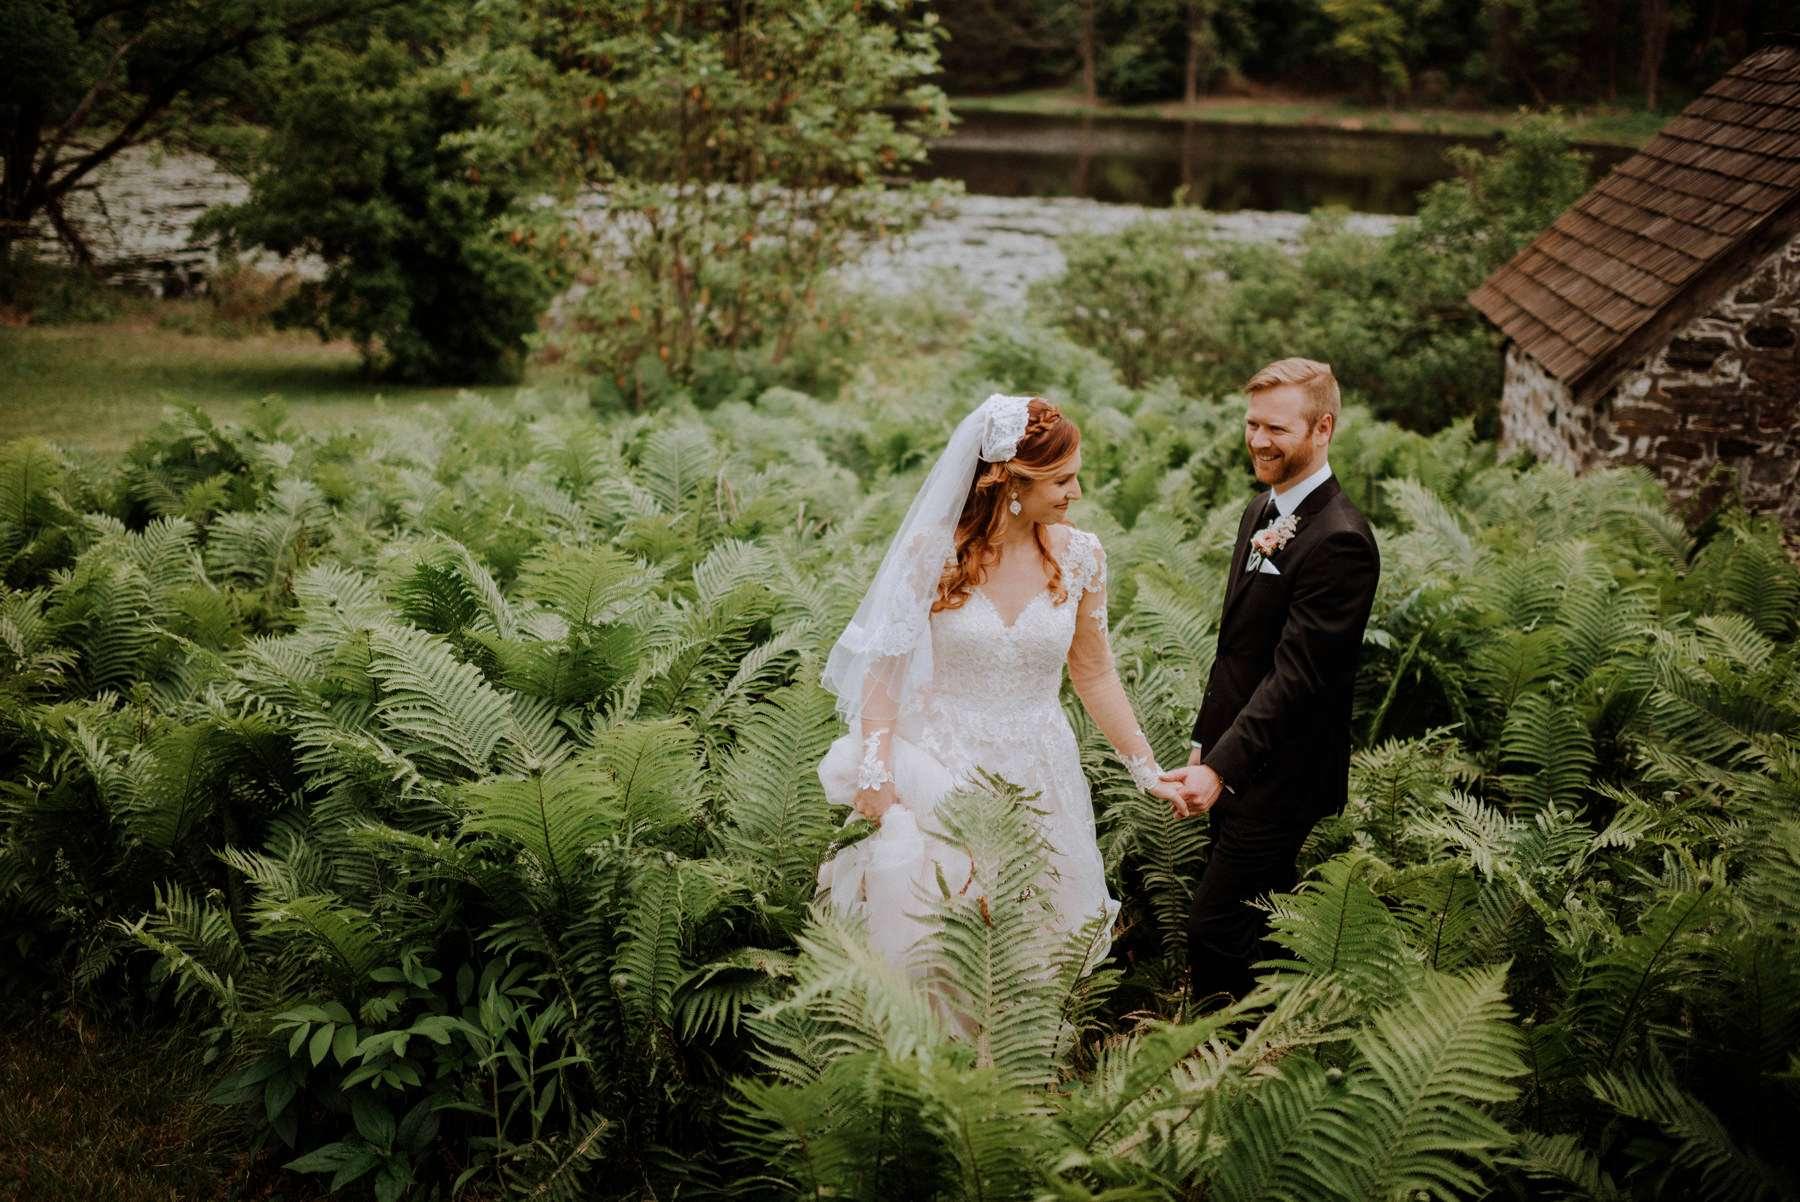 welkinweir-wedding-photography-21.jpg